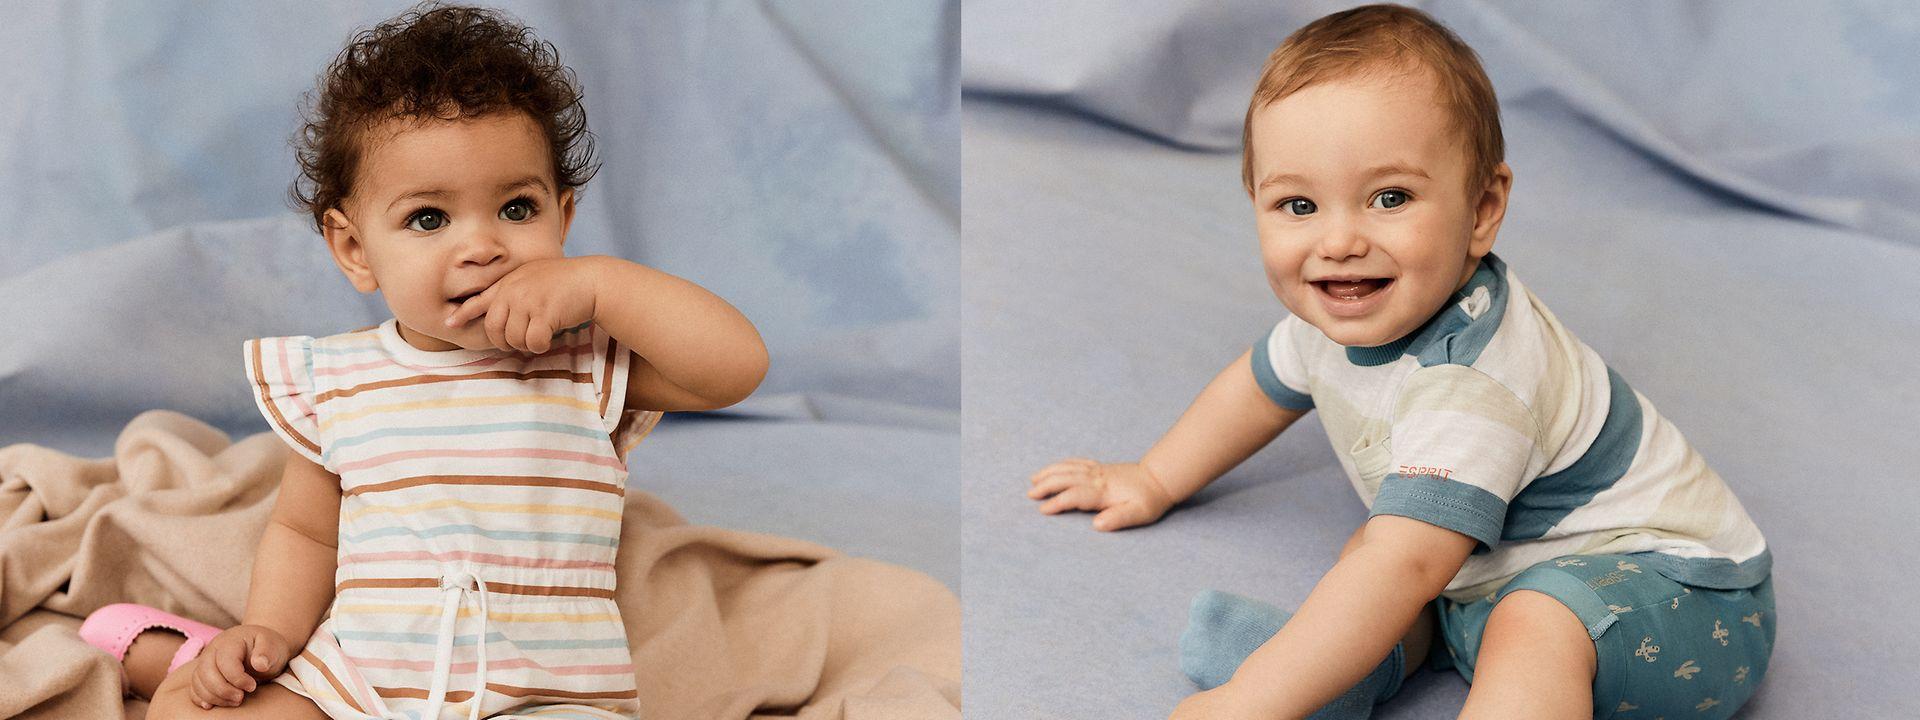 050421- kids - startpage- main banner - baby - IMG